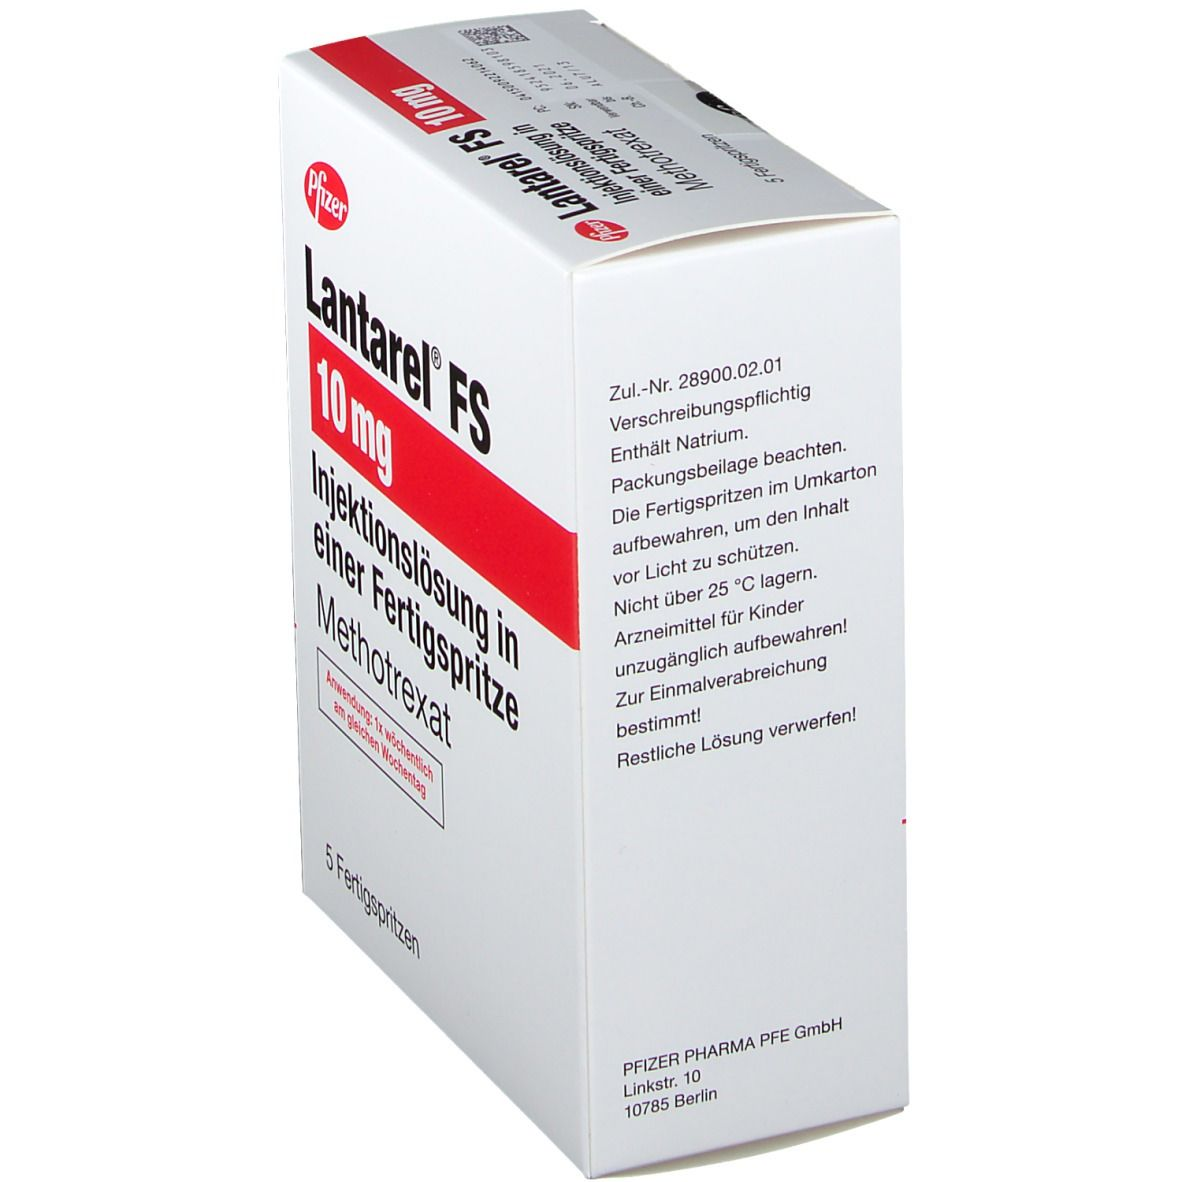 Lantarel® FS 10 mg Fertigspritzen